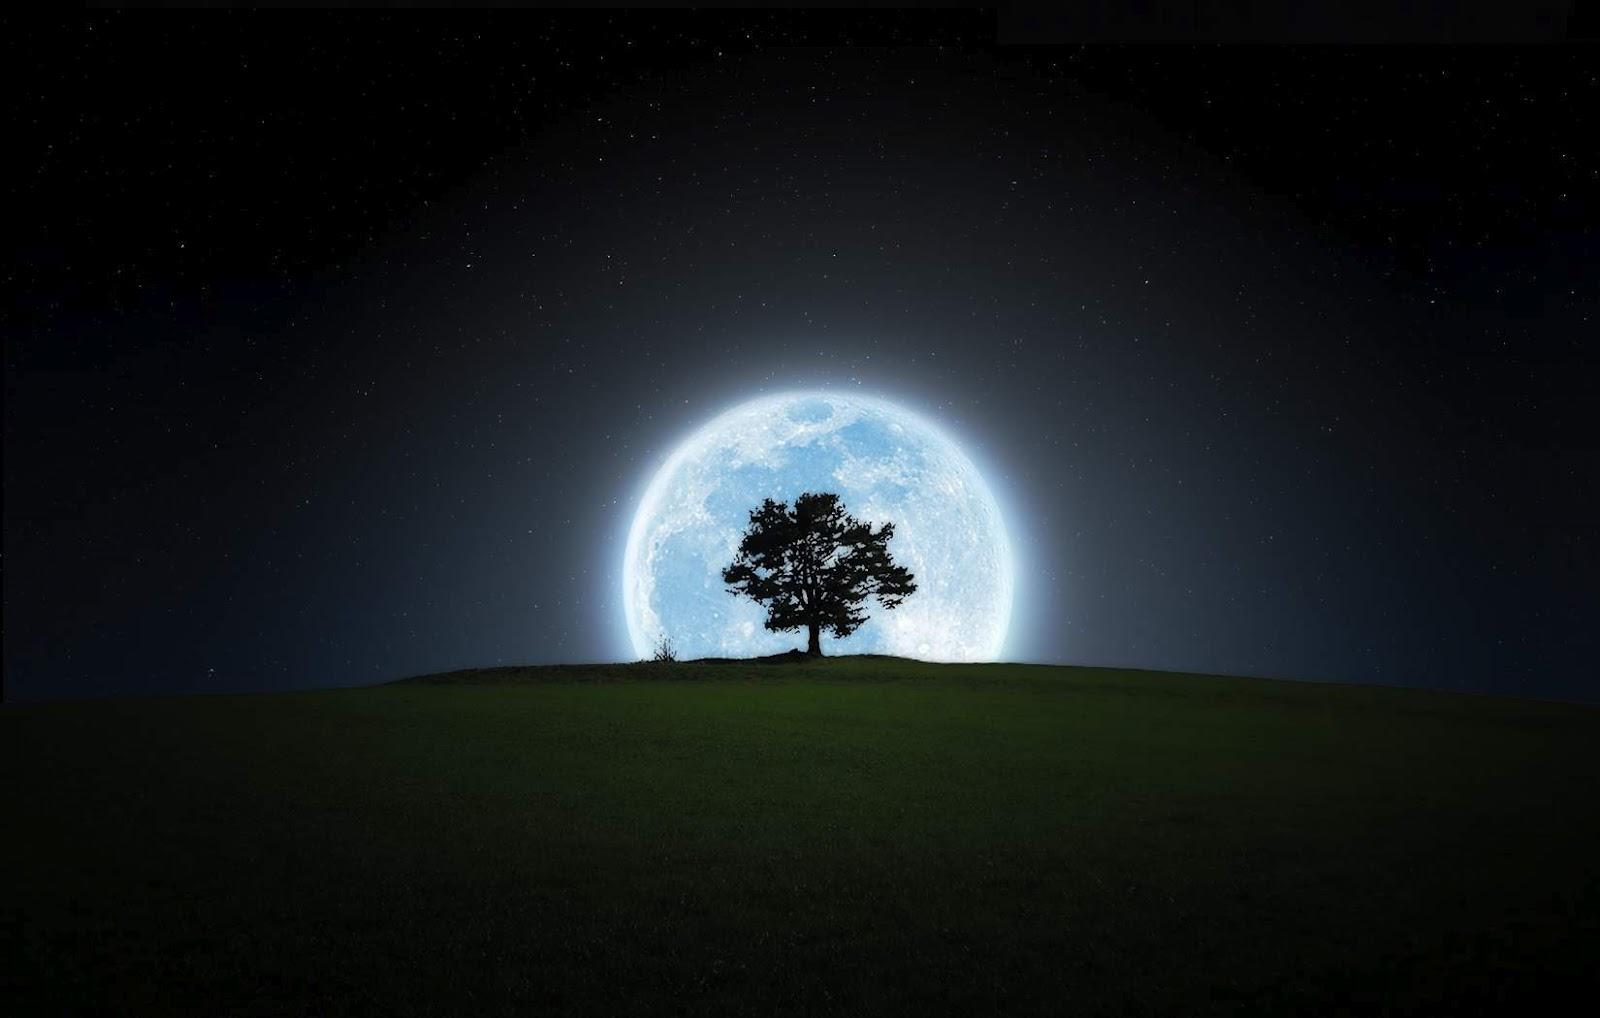 hd full moon wallpaper - photo #6